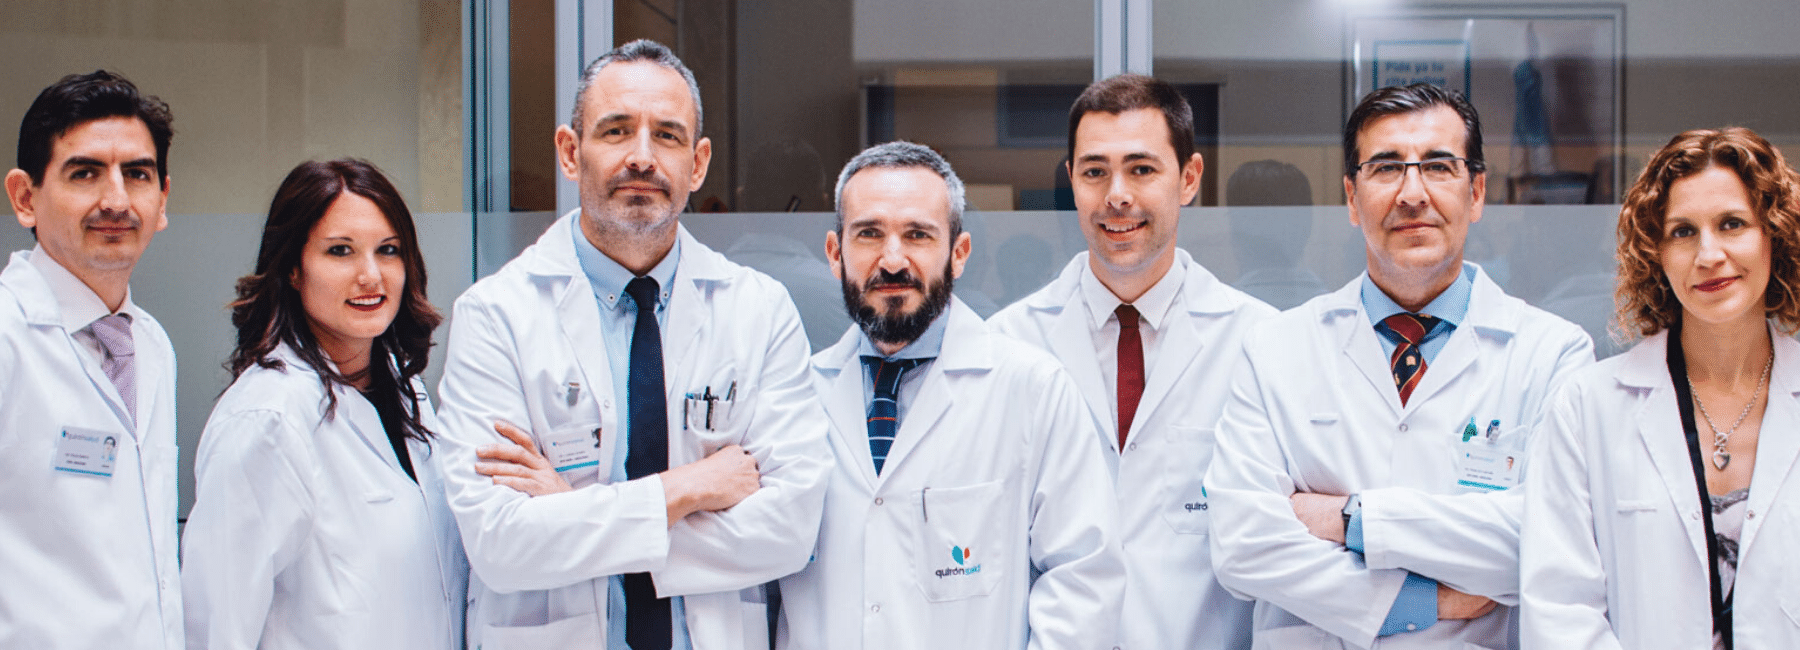 Equipo especialista en urologia malaga del hospital quiron